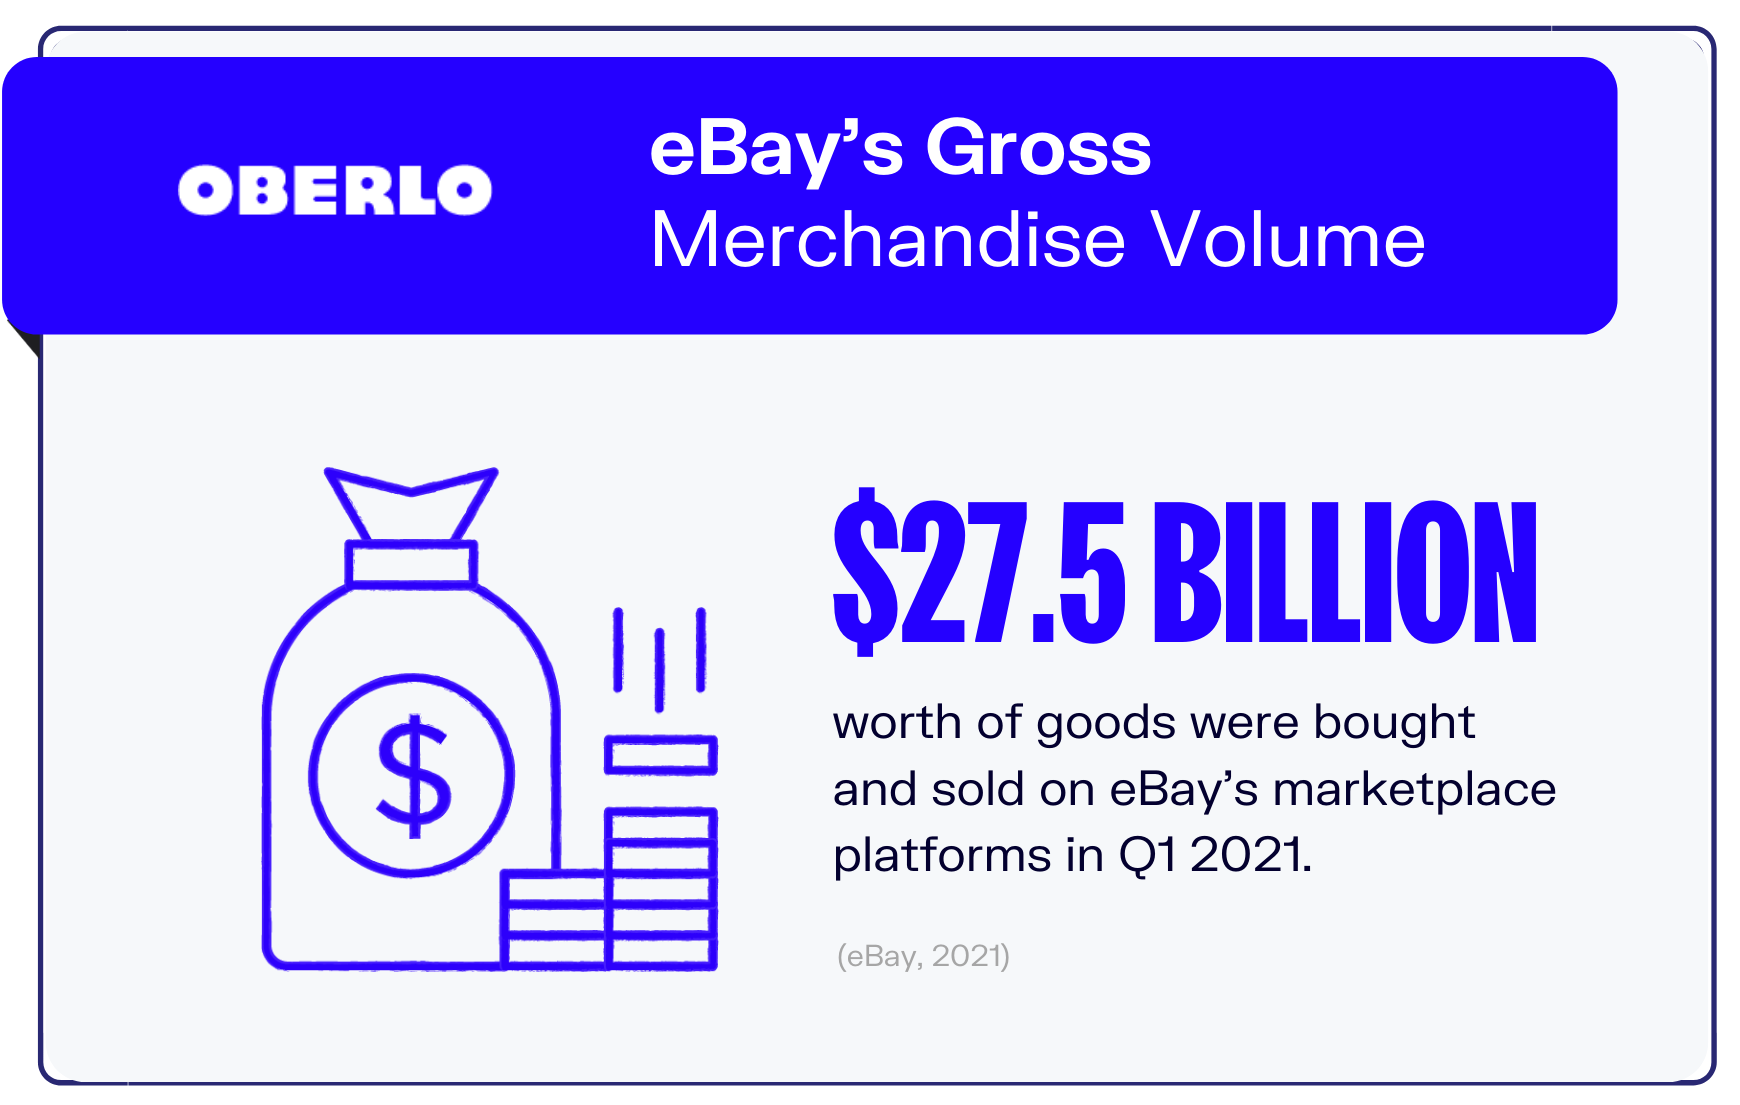 ebay statistics graphic 5